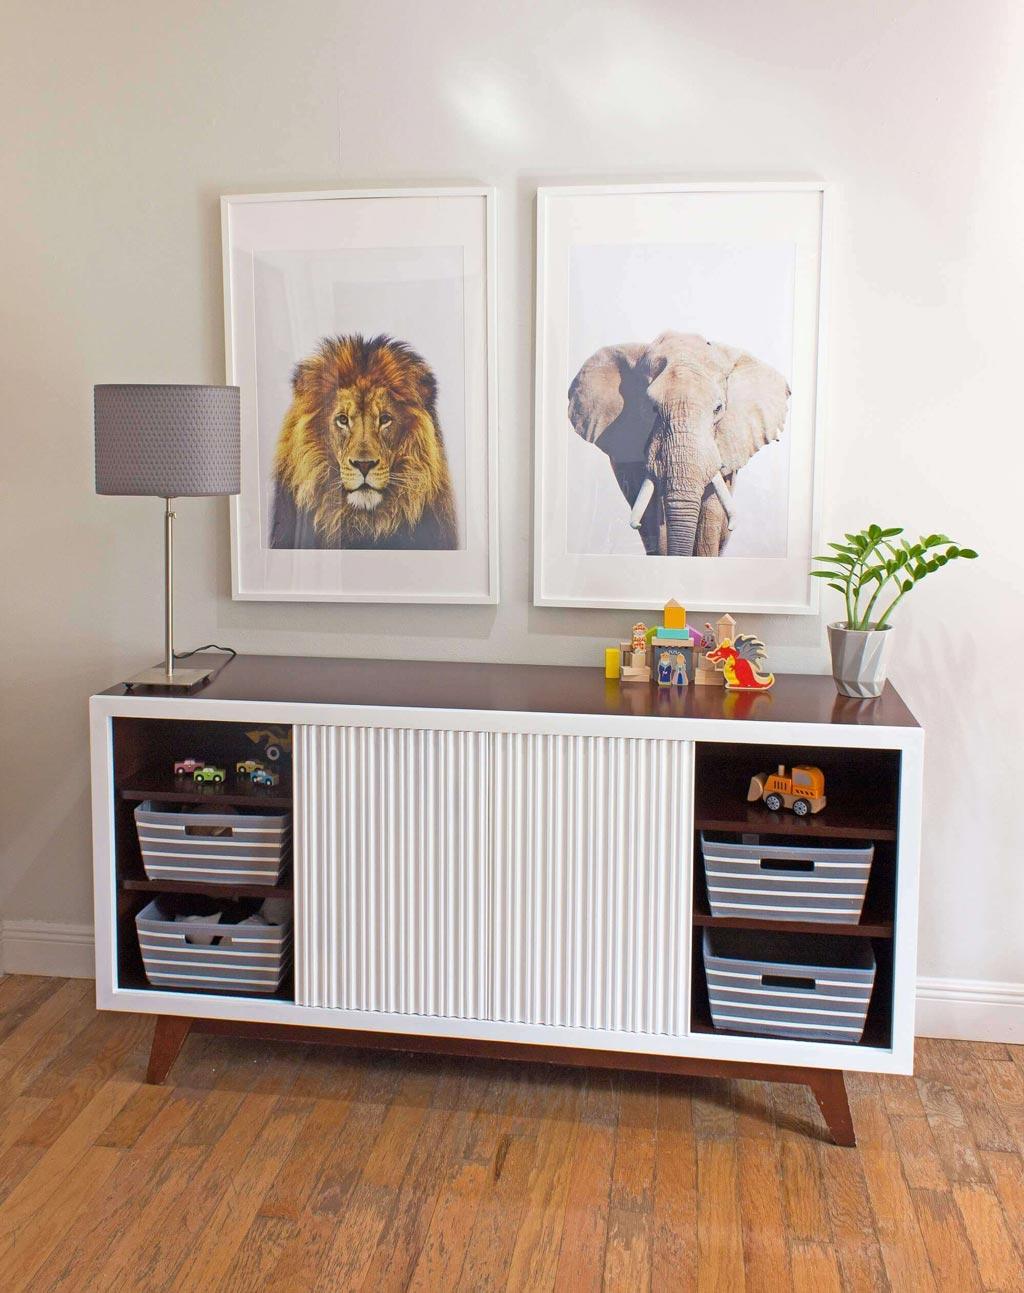 using art and interior design for children's bedroom